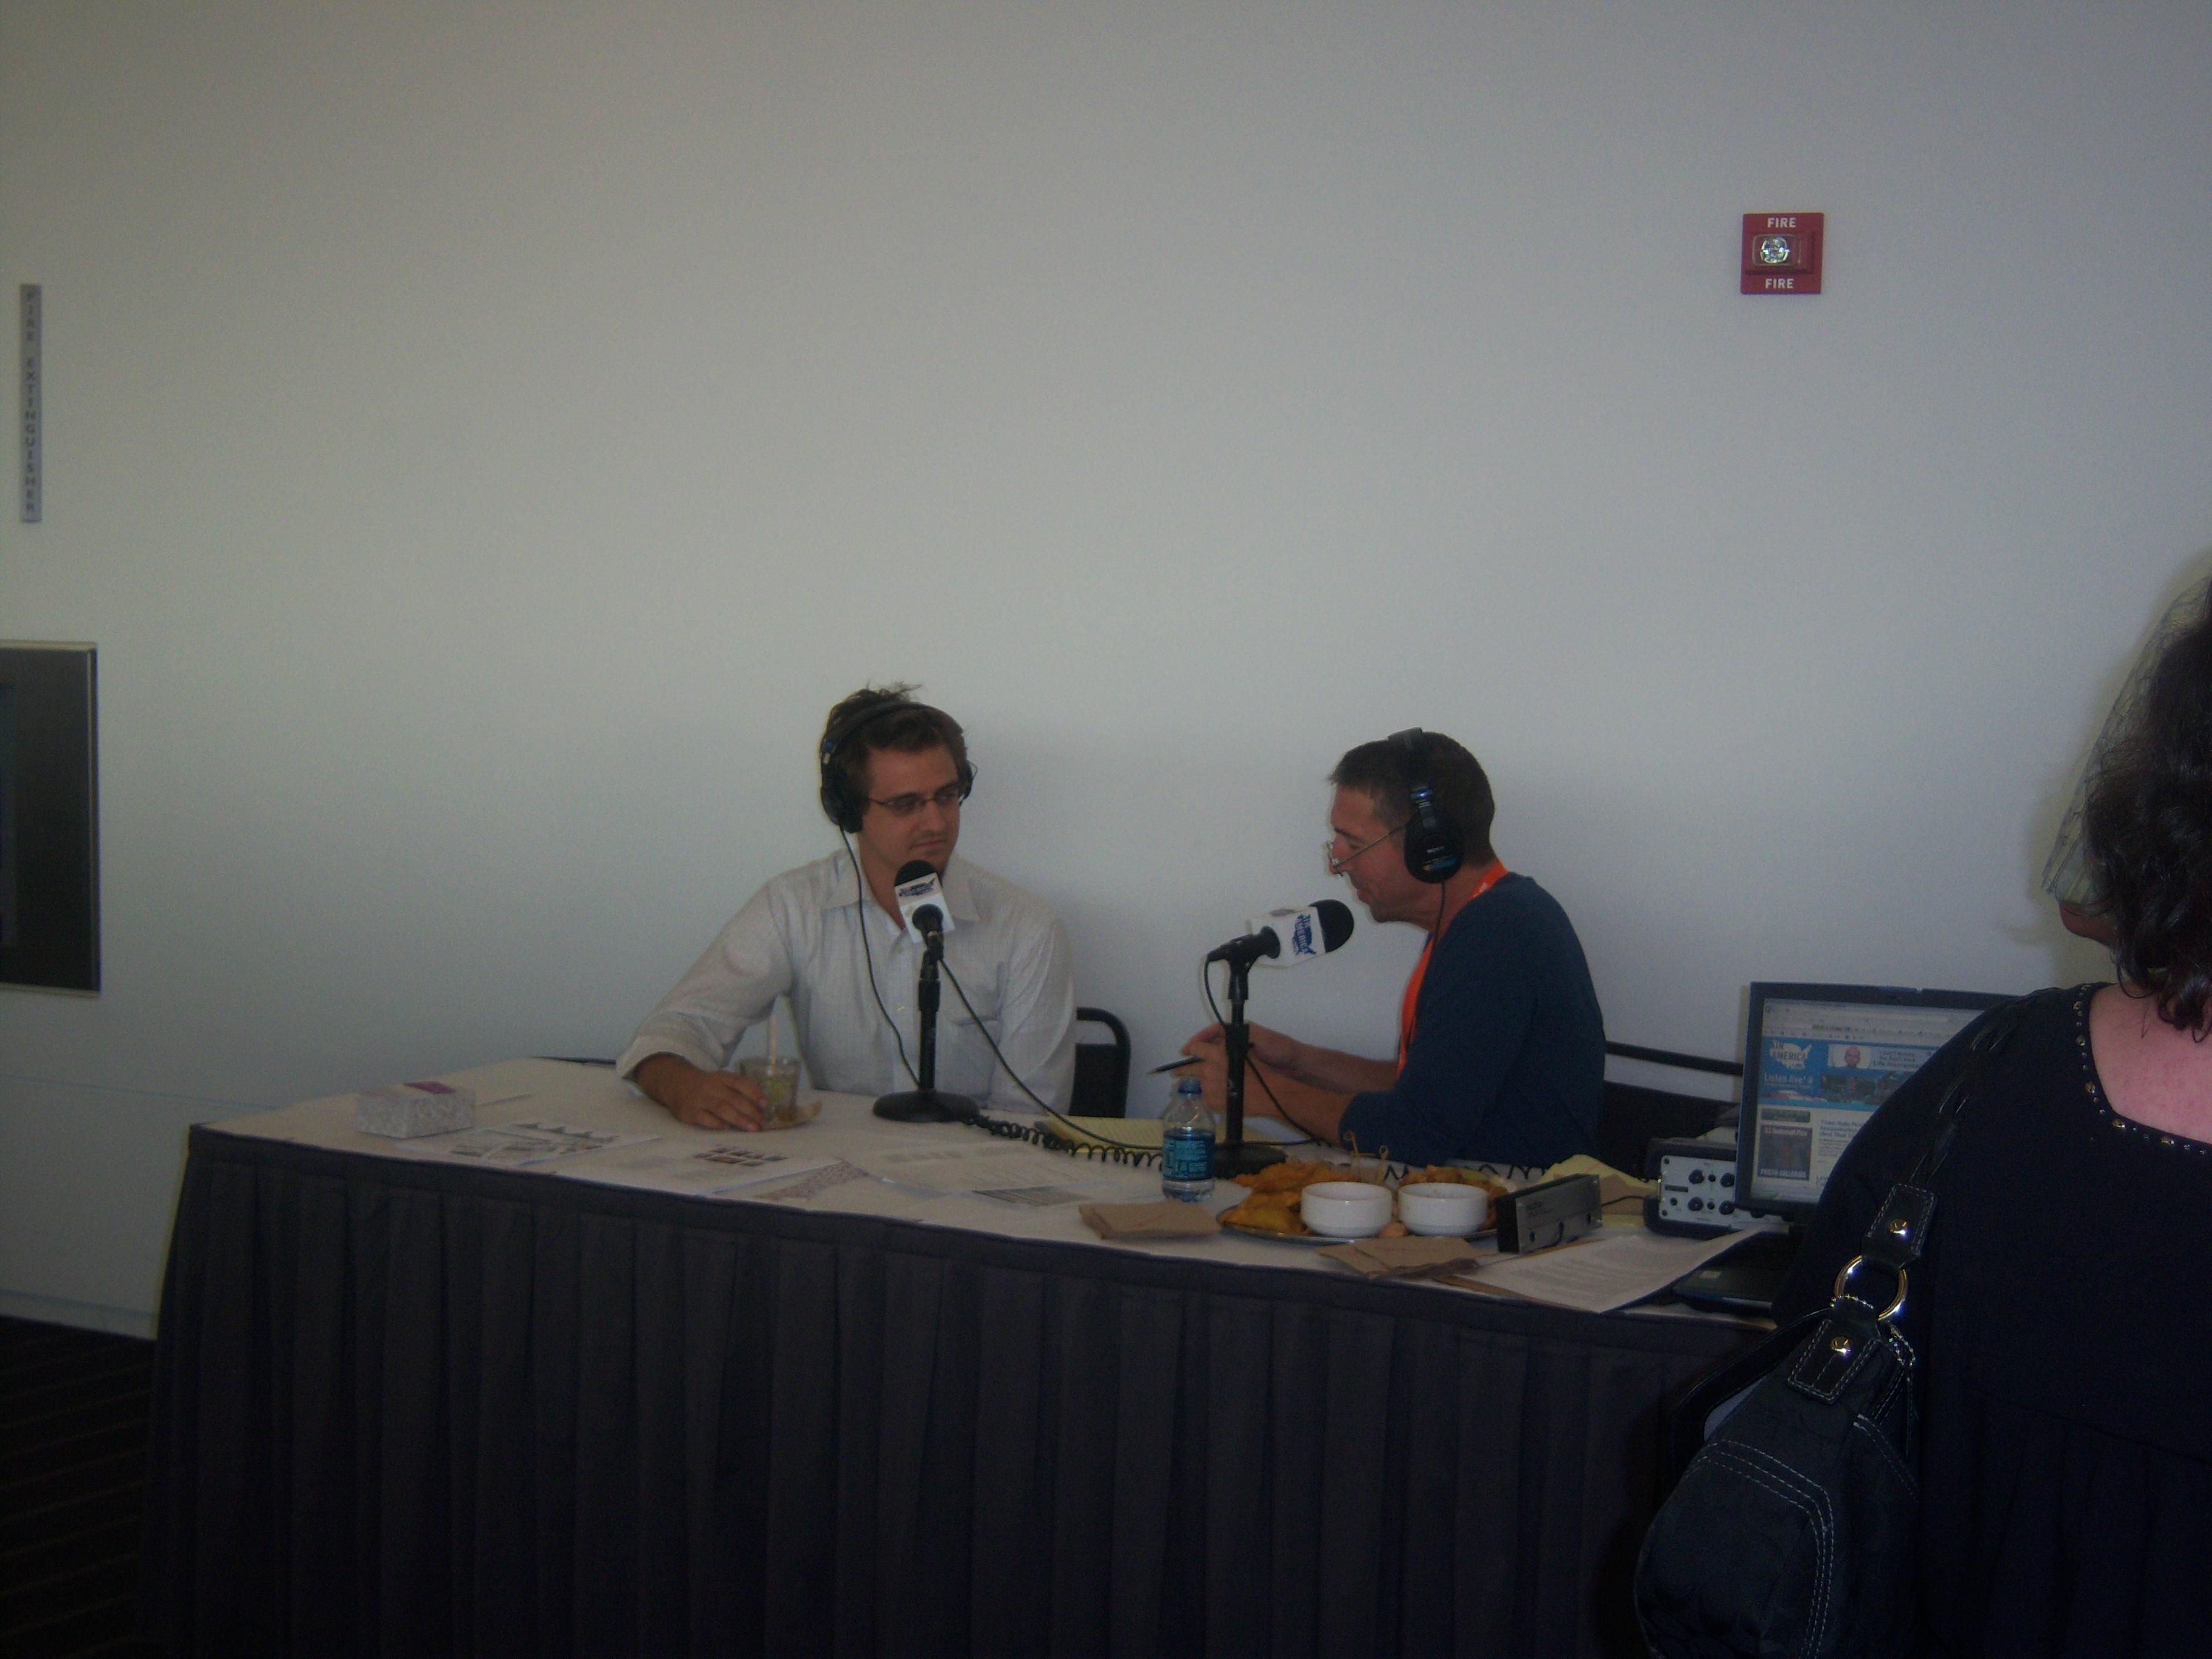 Ron Reagan interviews Chris Hayes on the radio